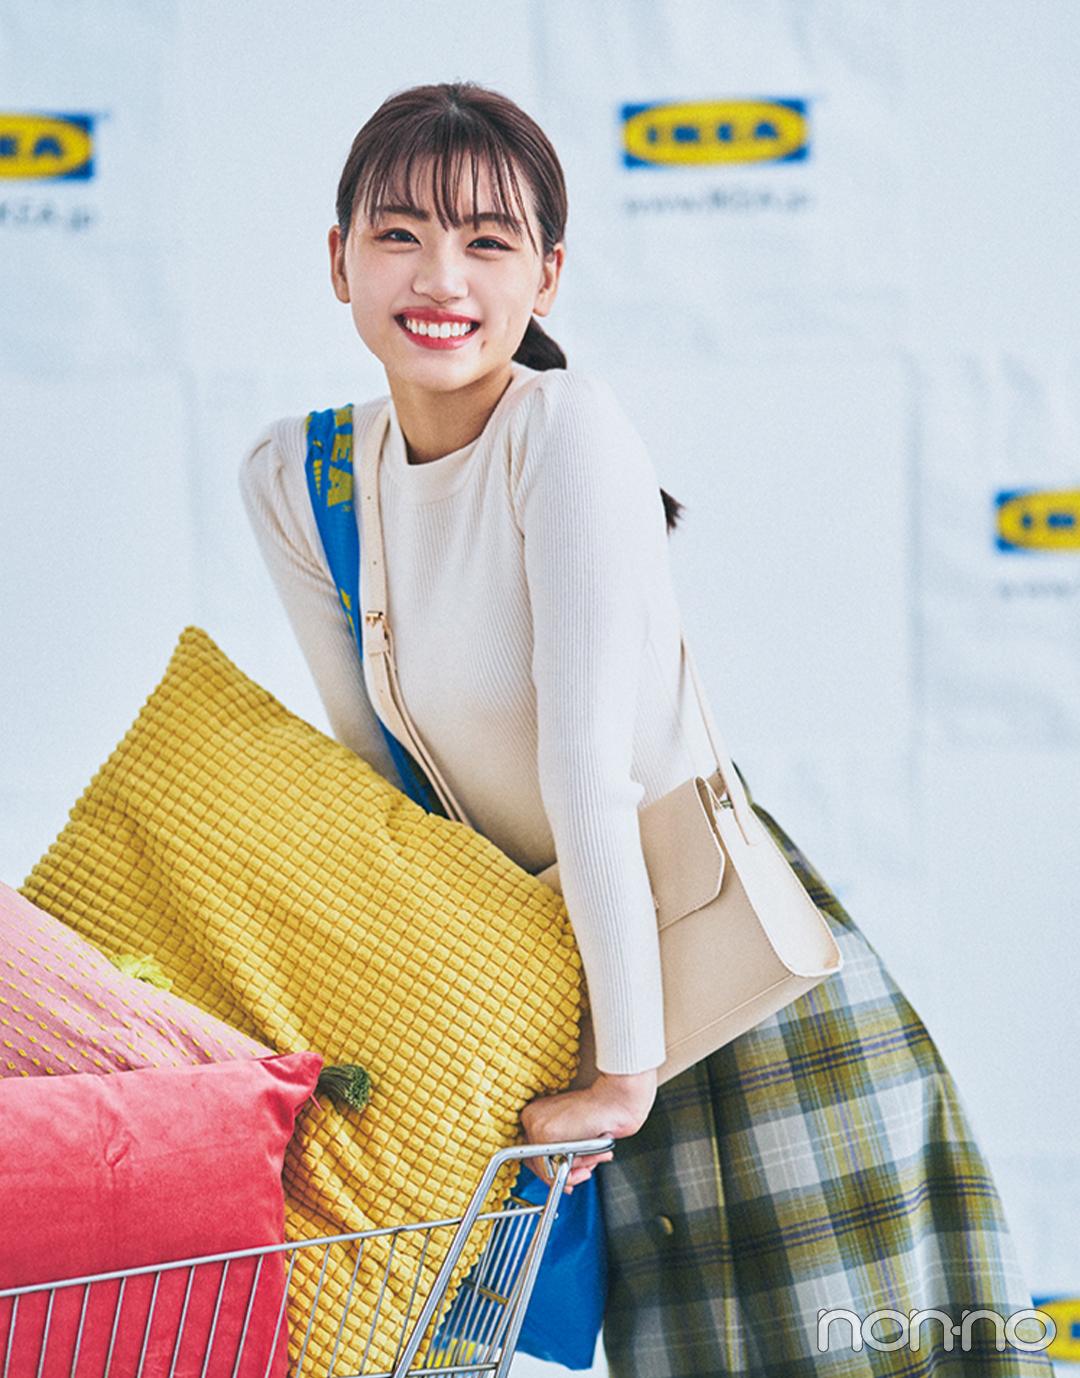 Photo Gallery|笑顔が最高の癒し! 佐々木美玲(日向坂46)フォトギャラリー_1_9